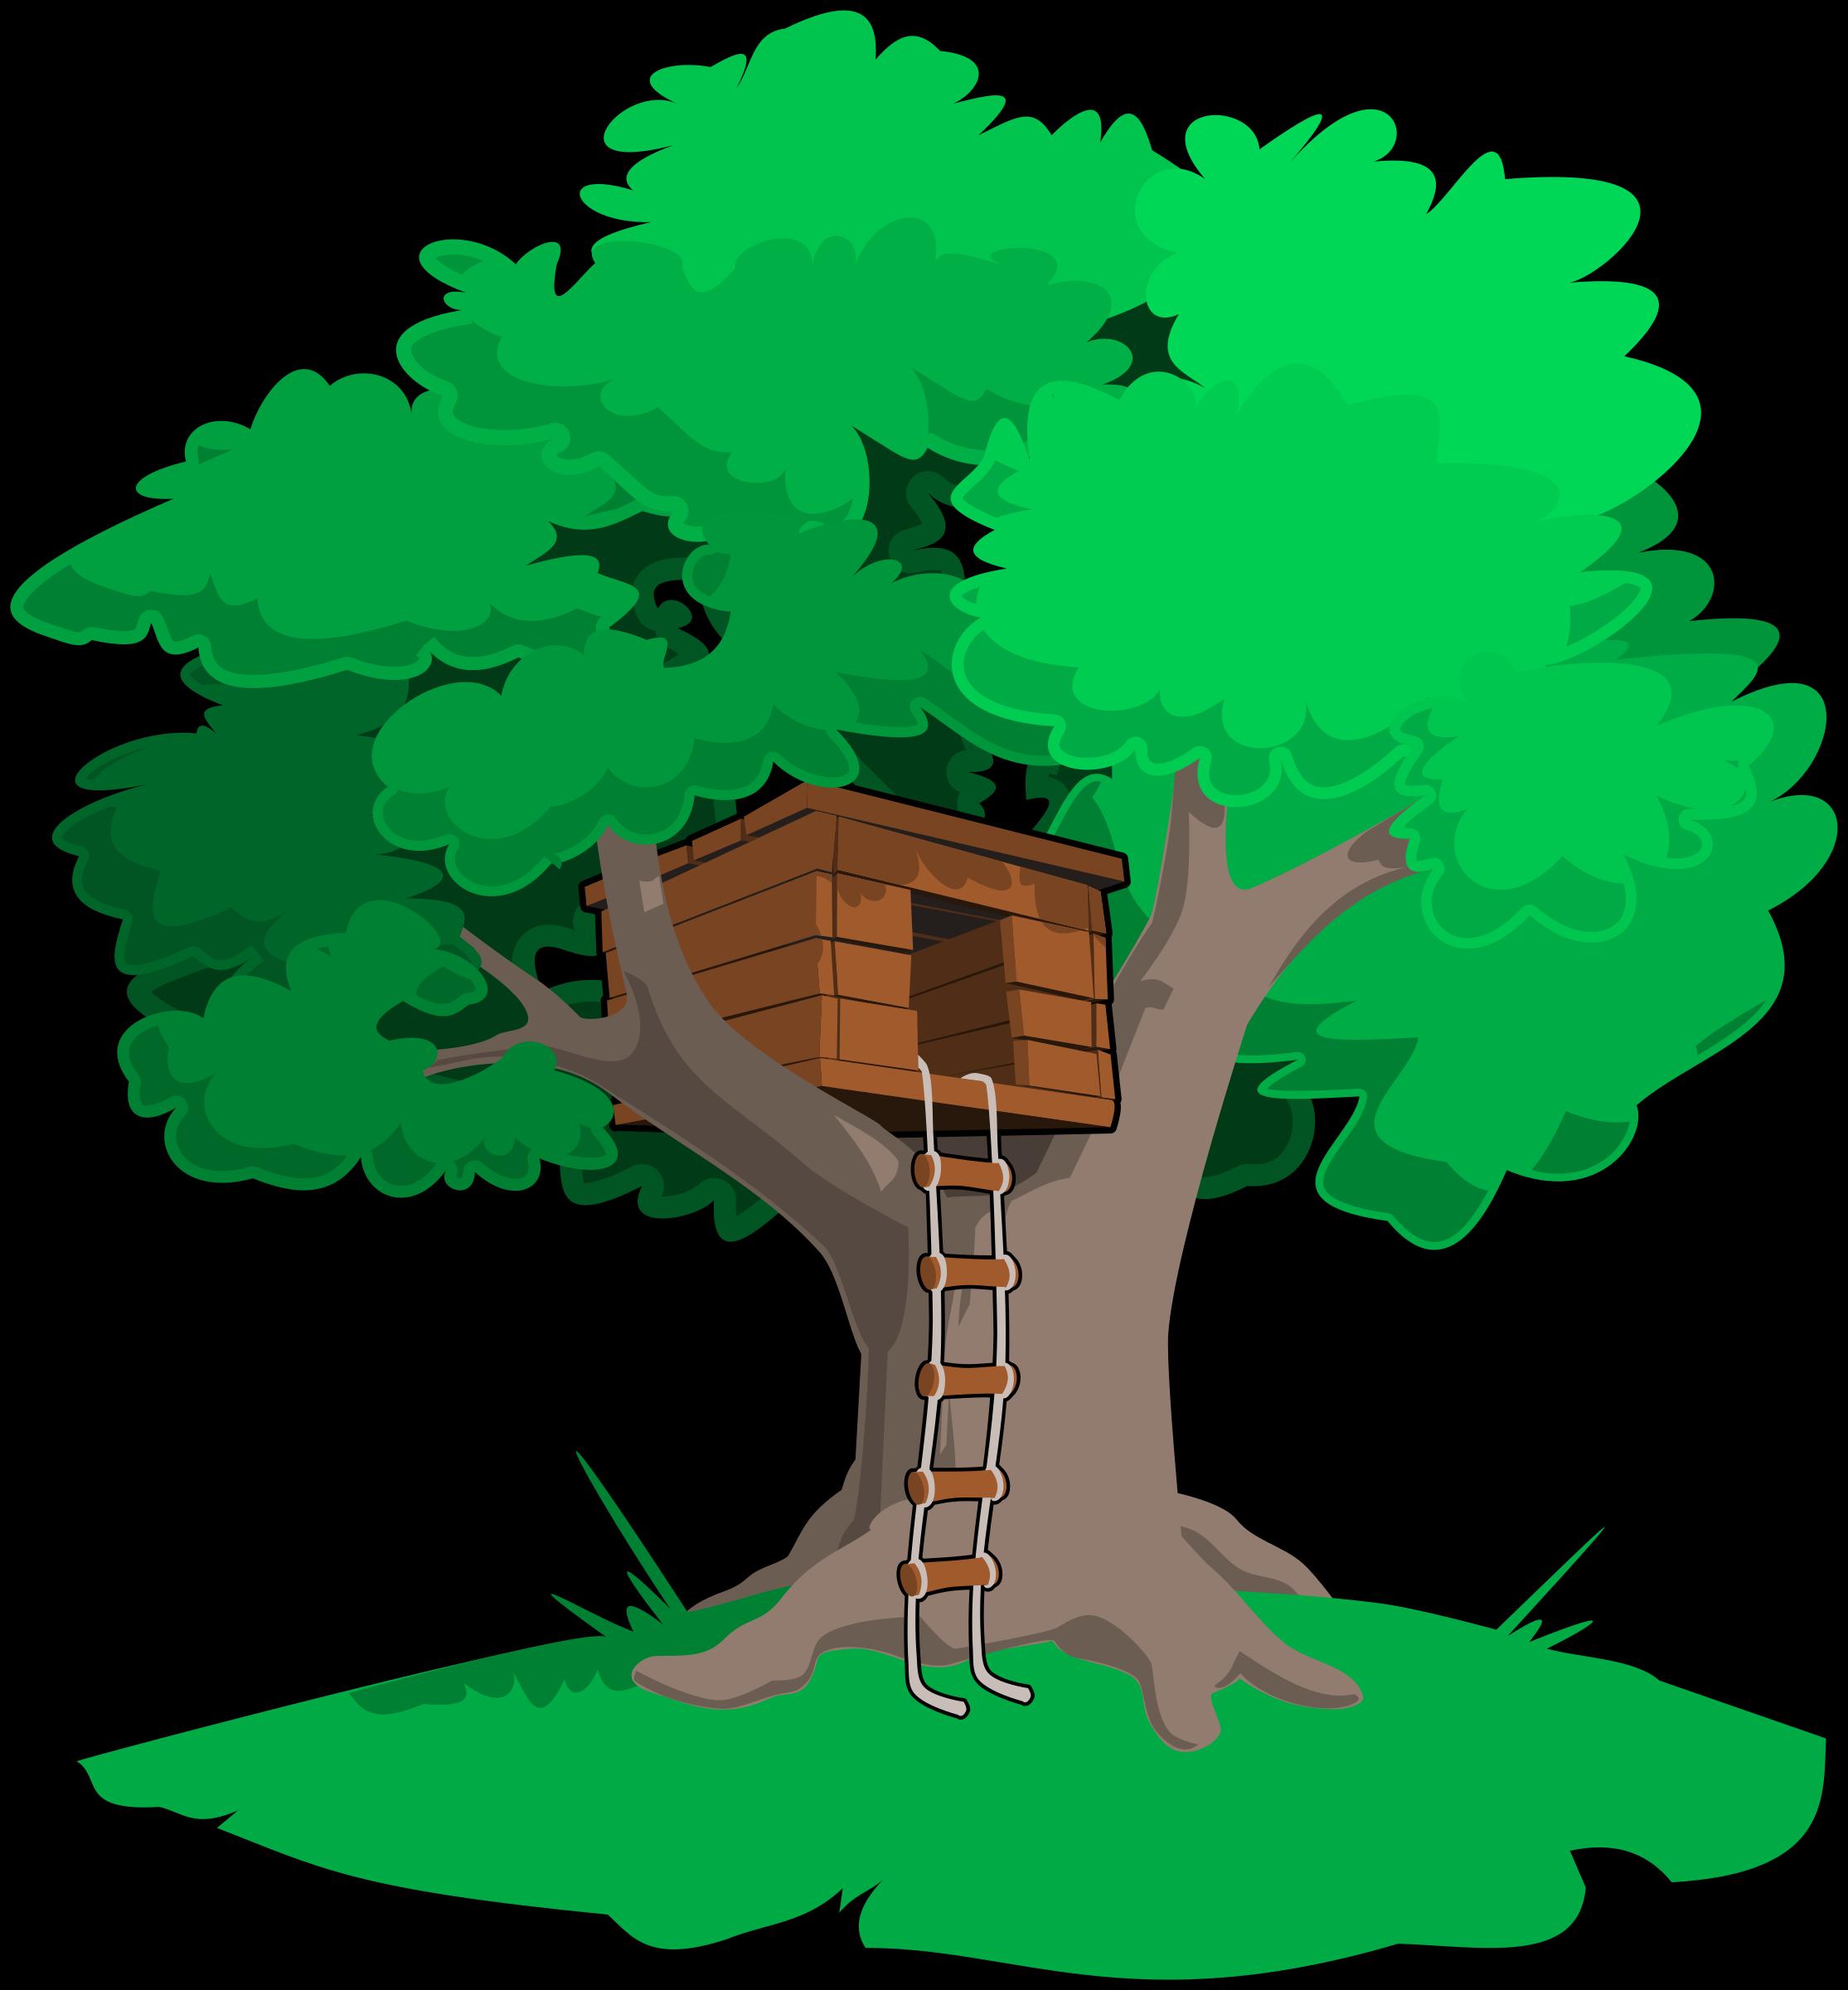 Clipart trees school. Tree house big image